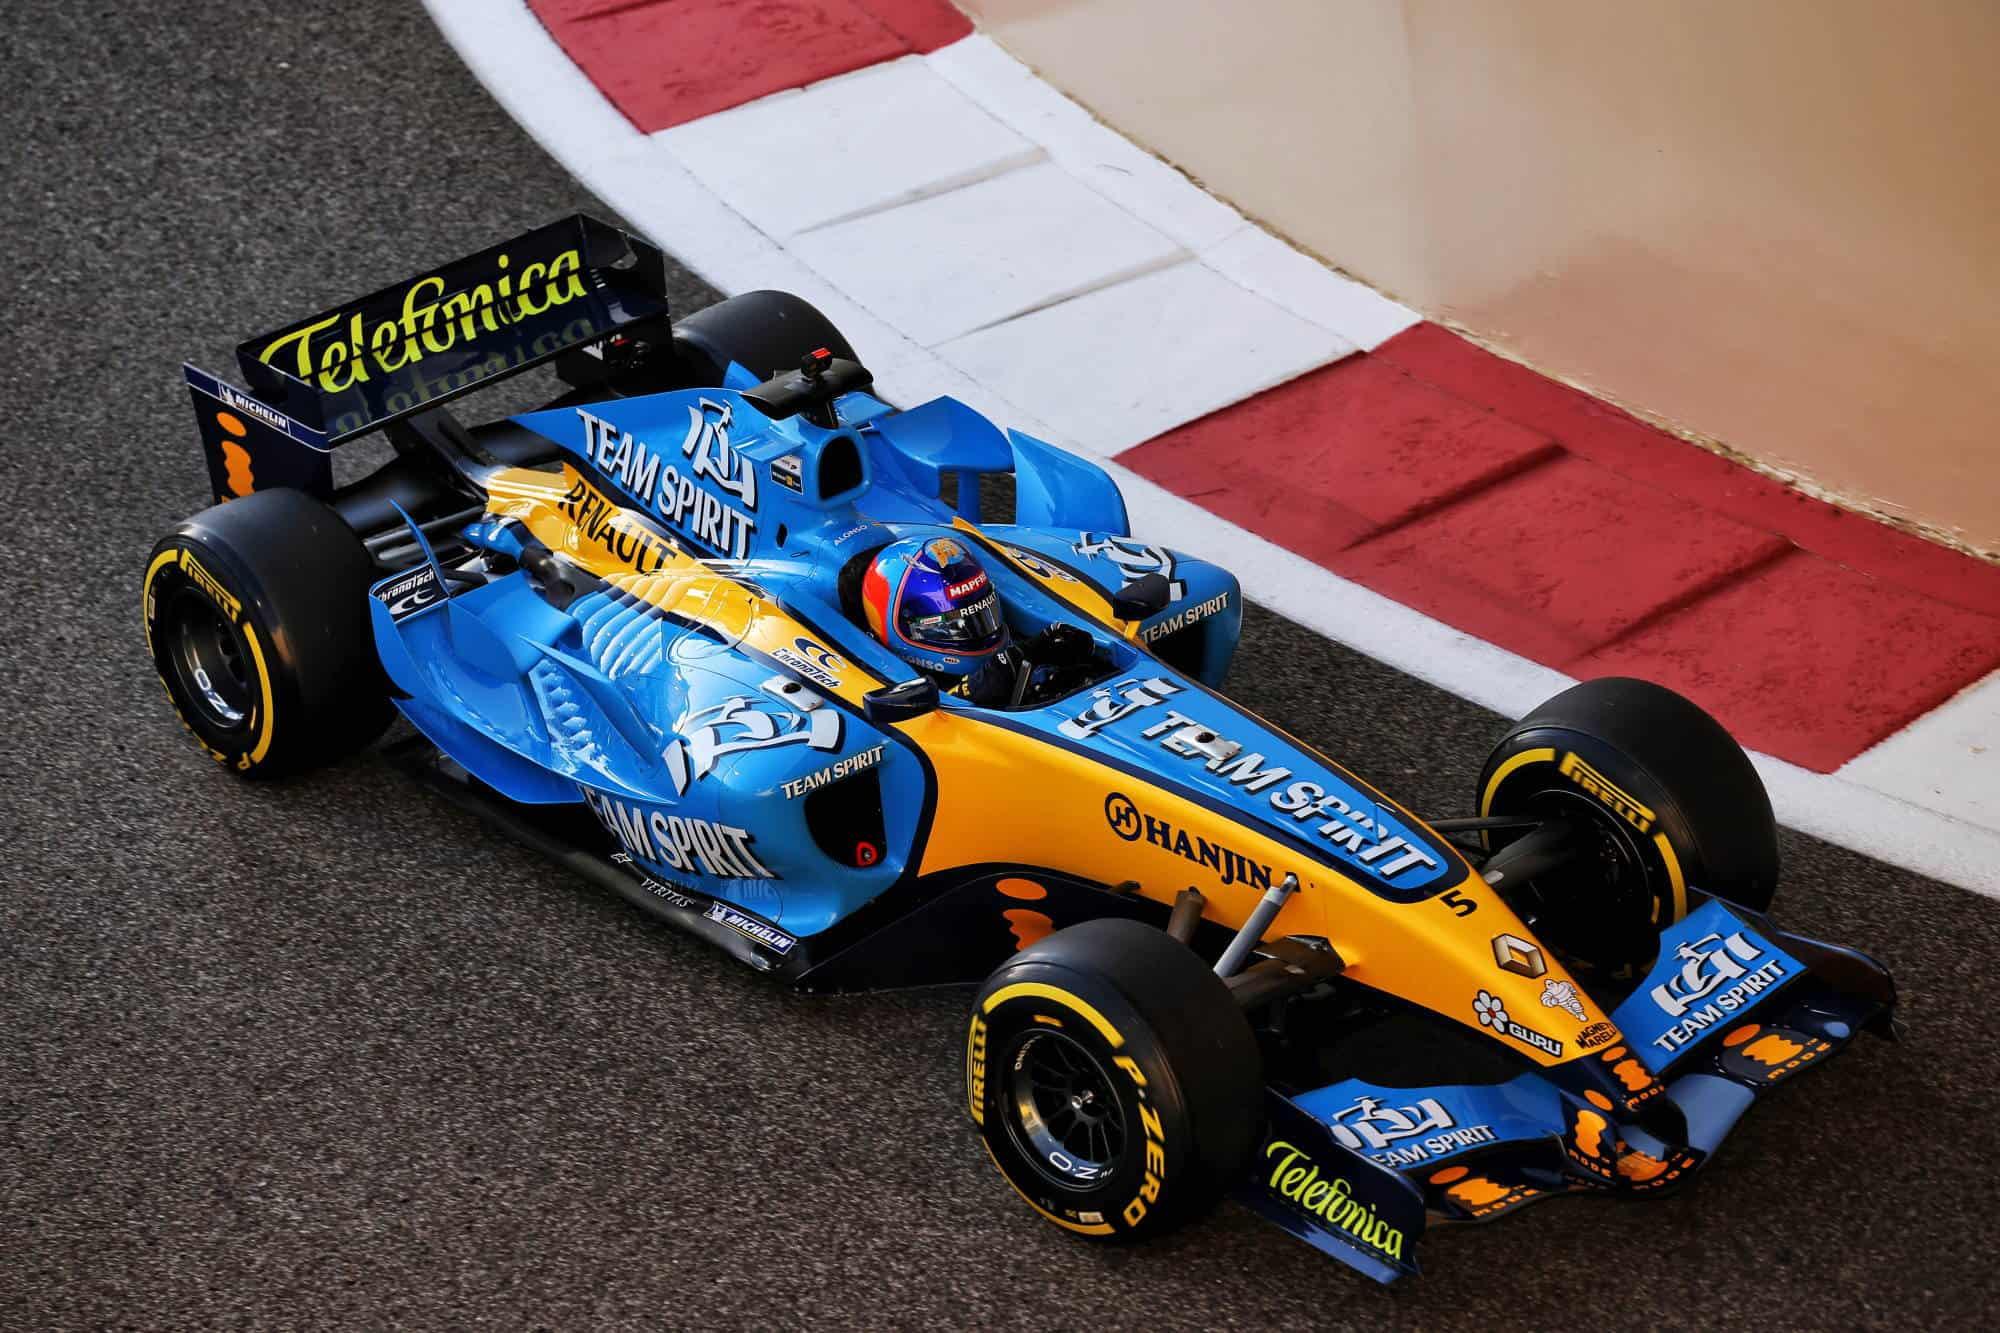 2020 Abu Dhabi GP Alonso Renault R25 demo run 2000 px Photo Renault